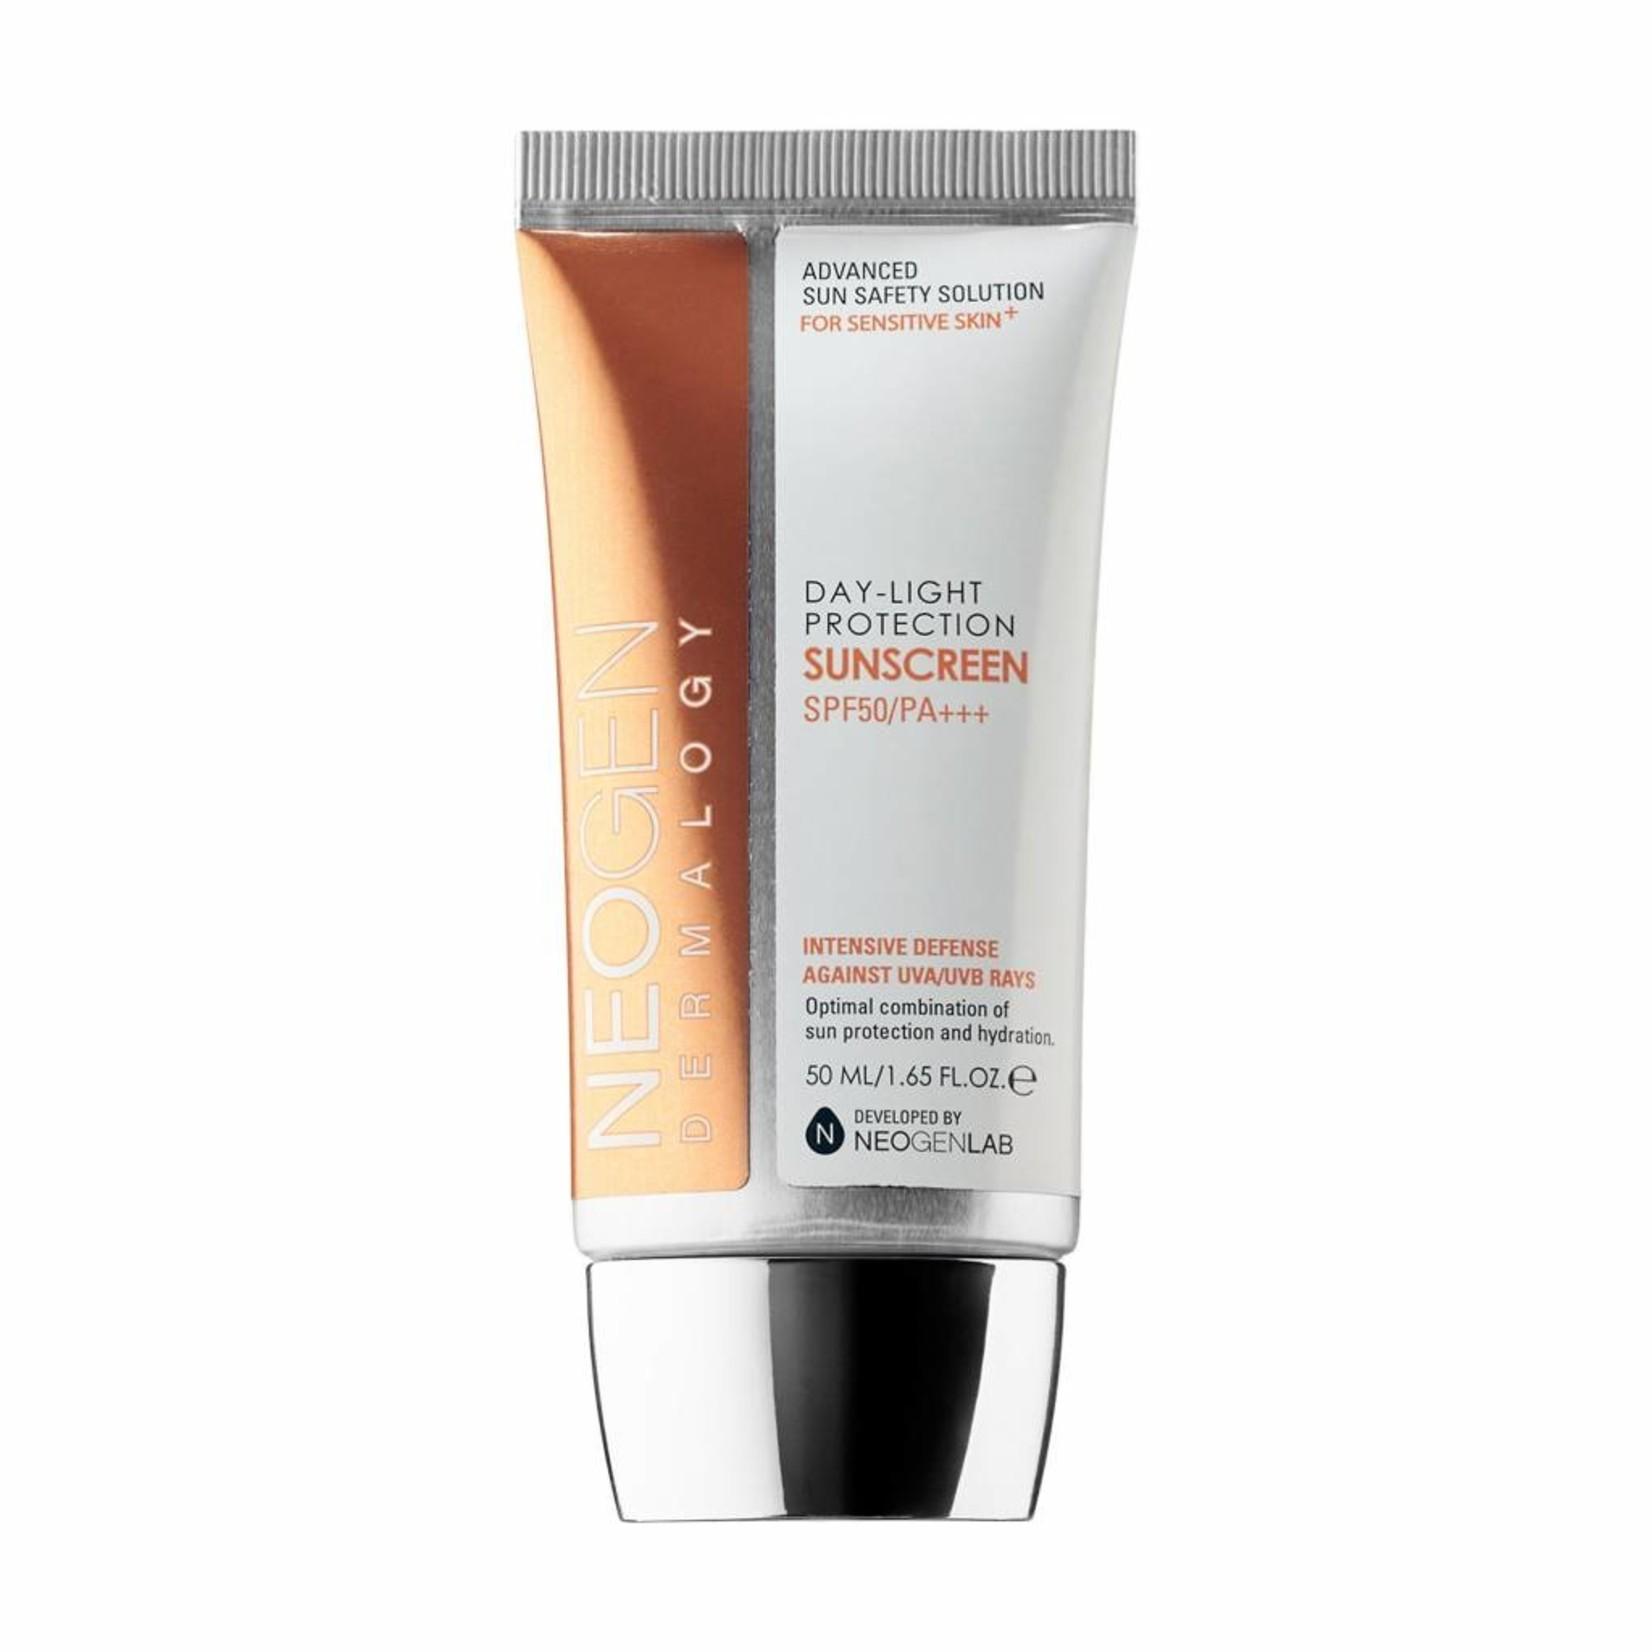 Neogen Day Light Protection Sunscreen SPF50/PA+++